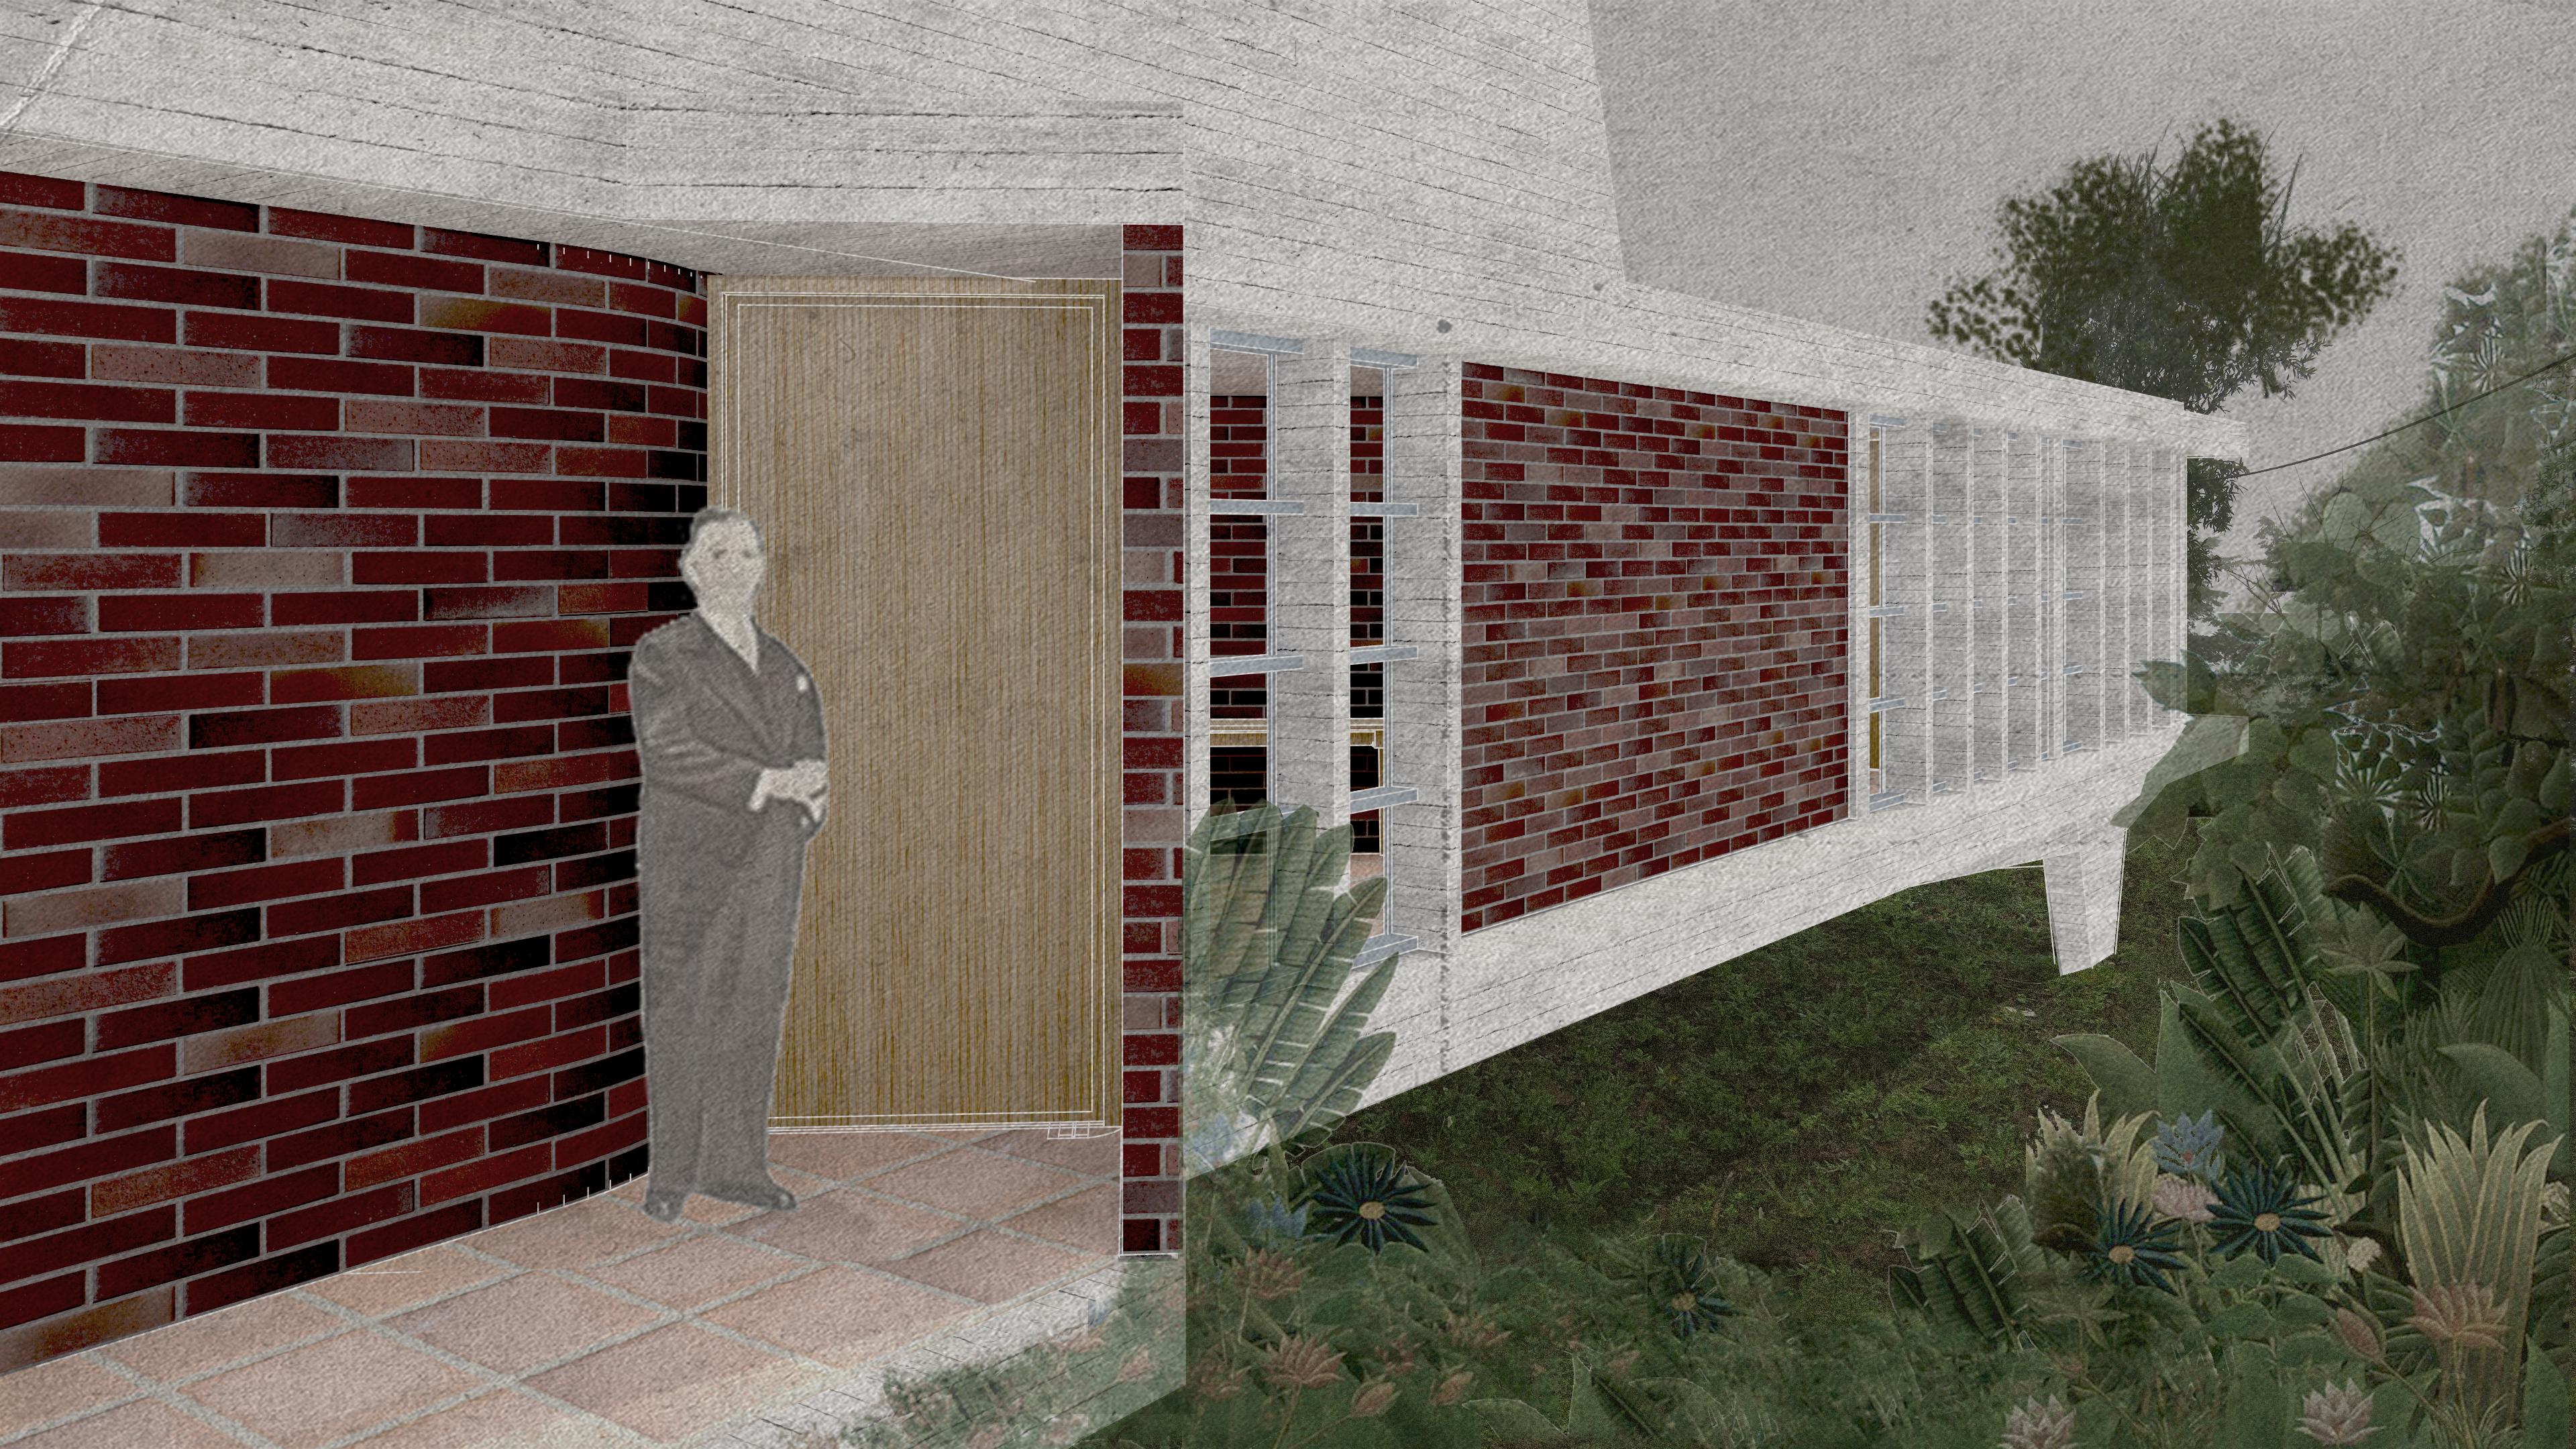 Casa 11 Valle de Tenza 2018